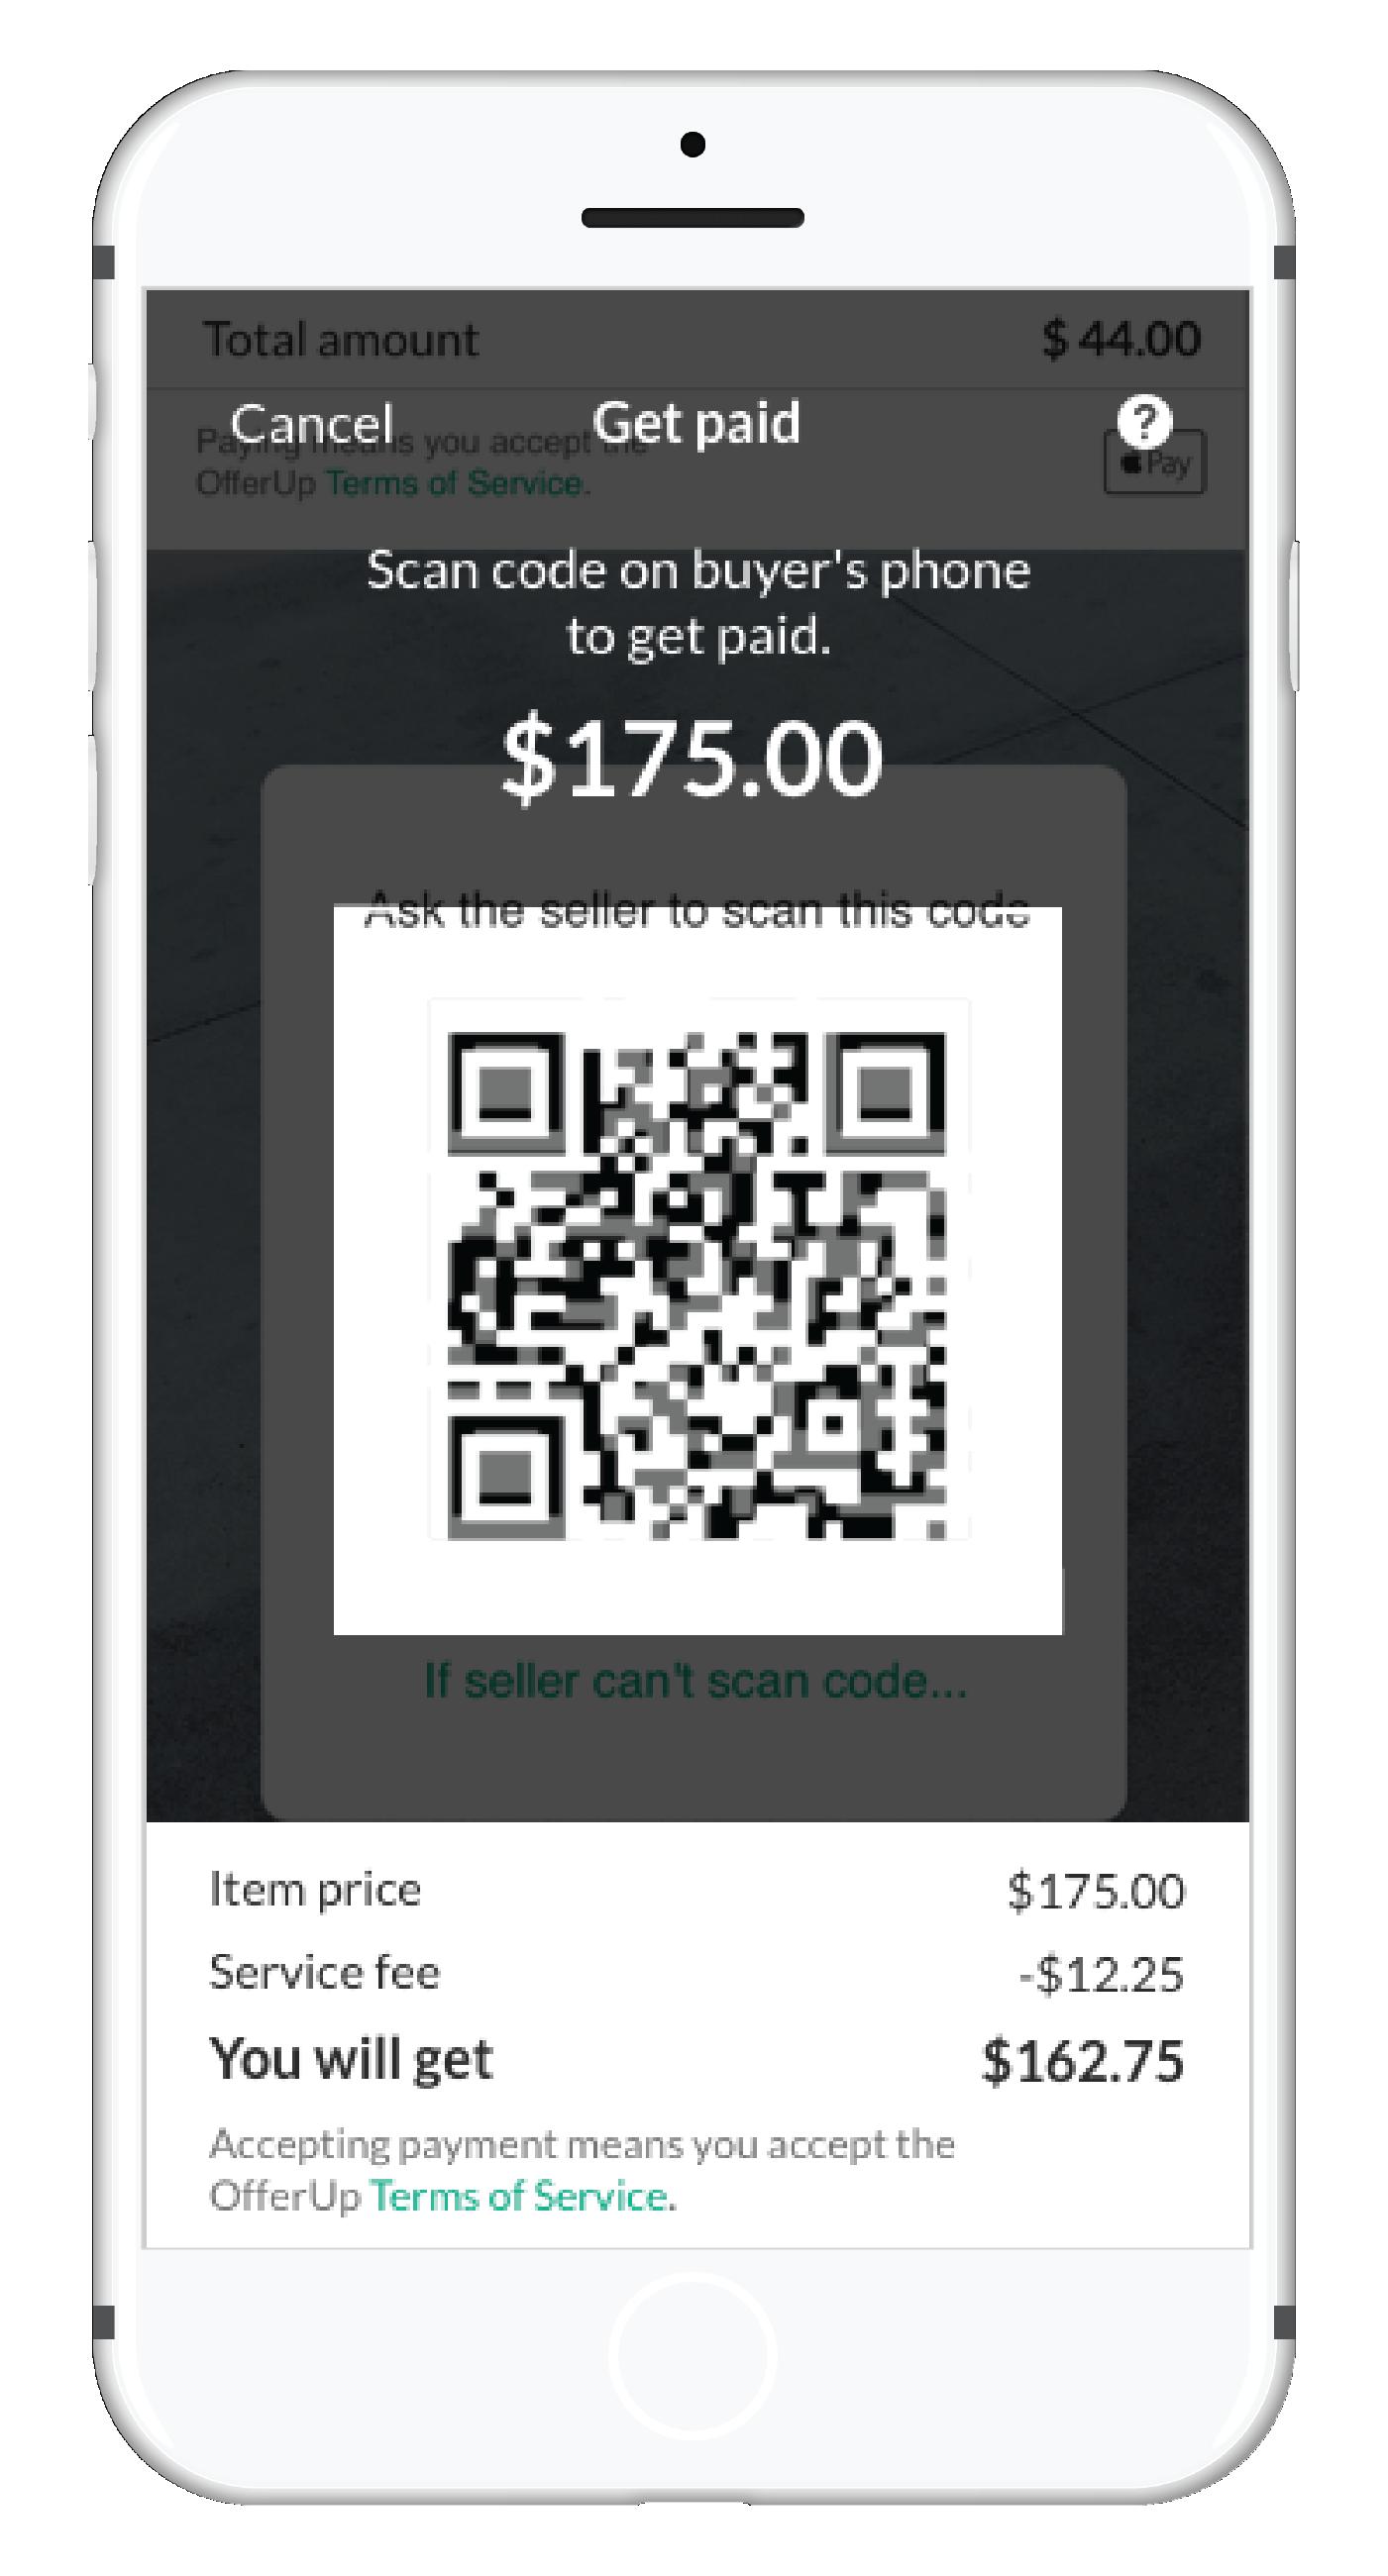 [Seller] QR code scan